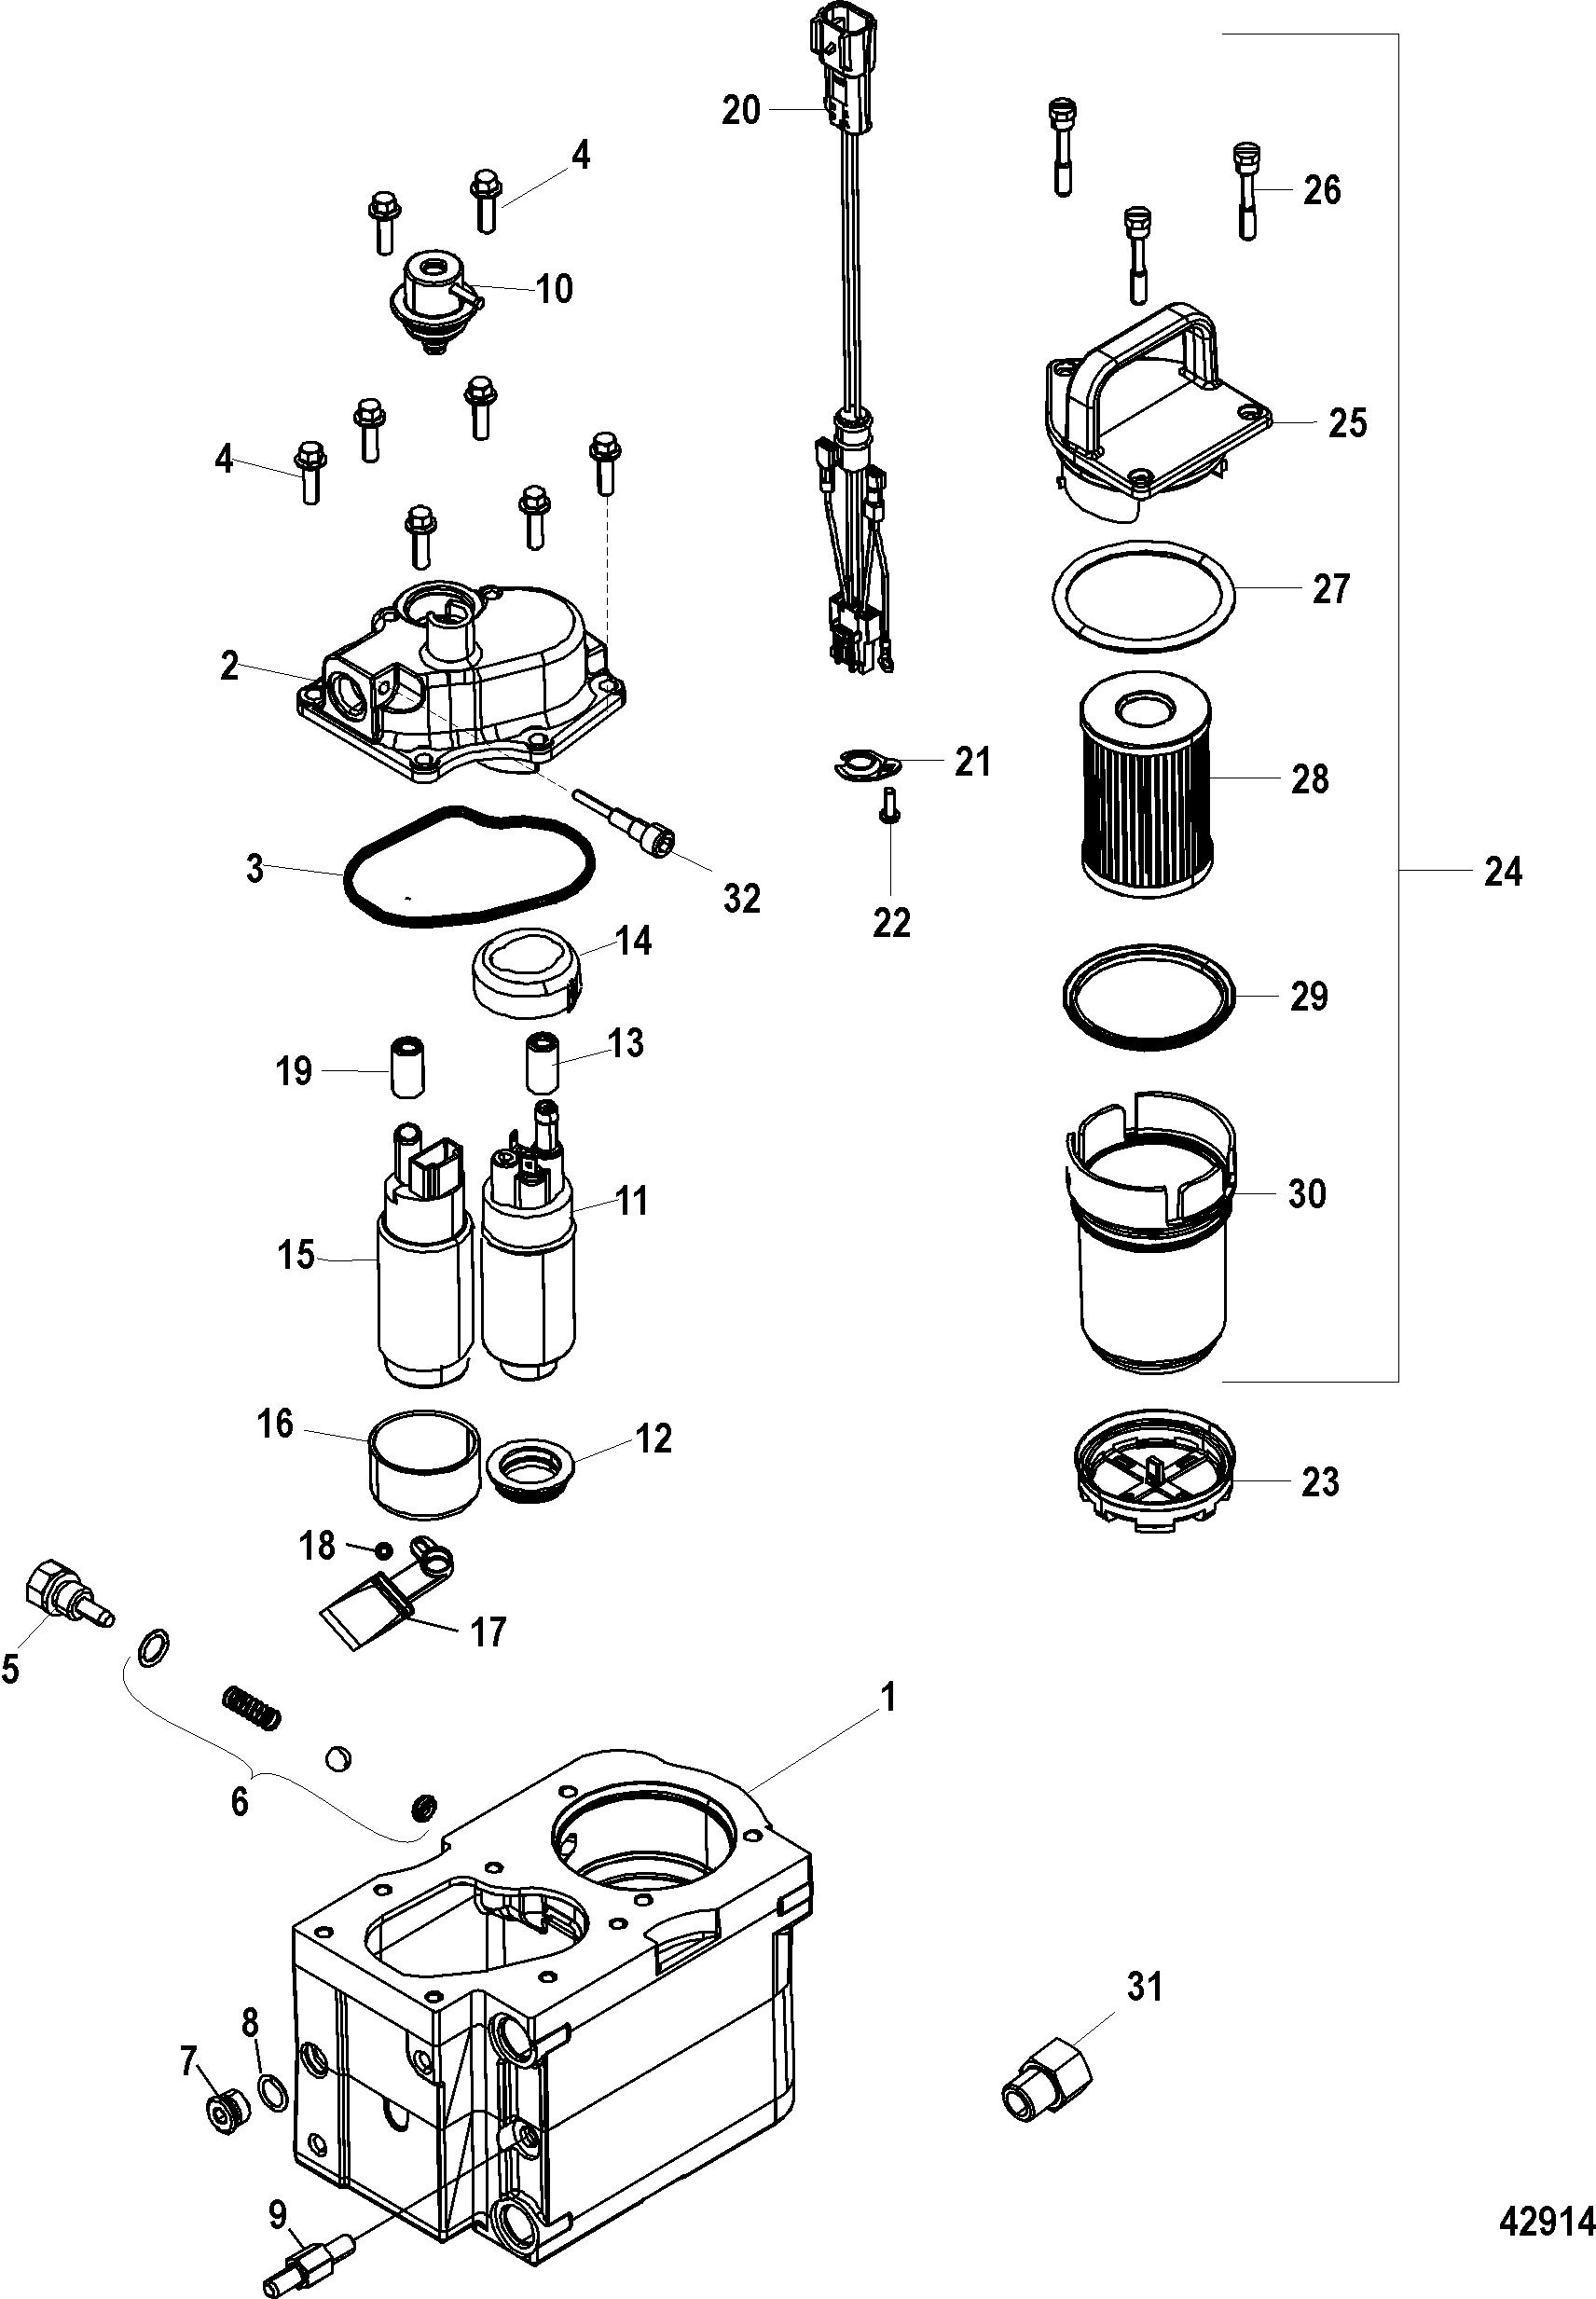 hardin marine - fuel module components